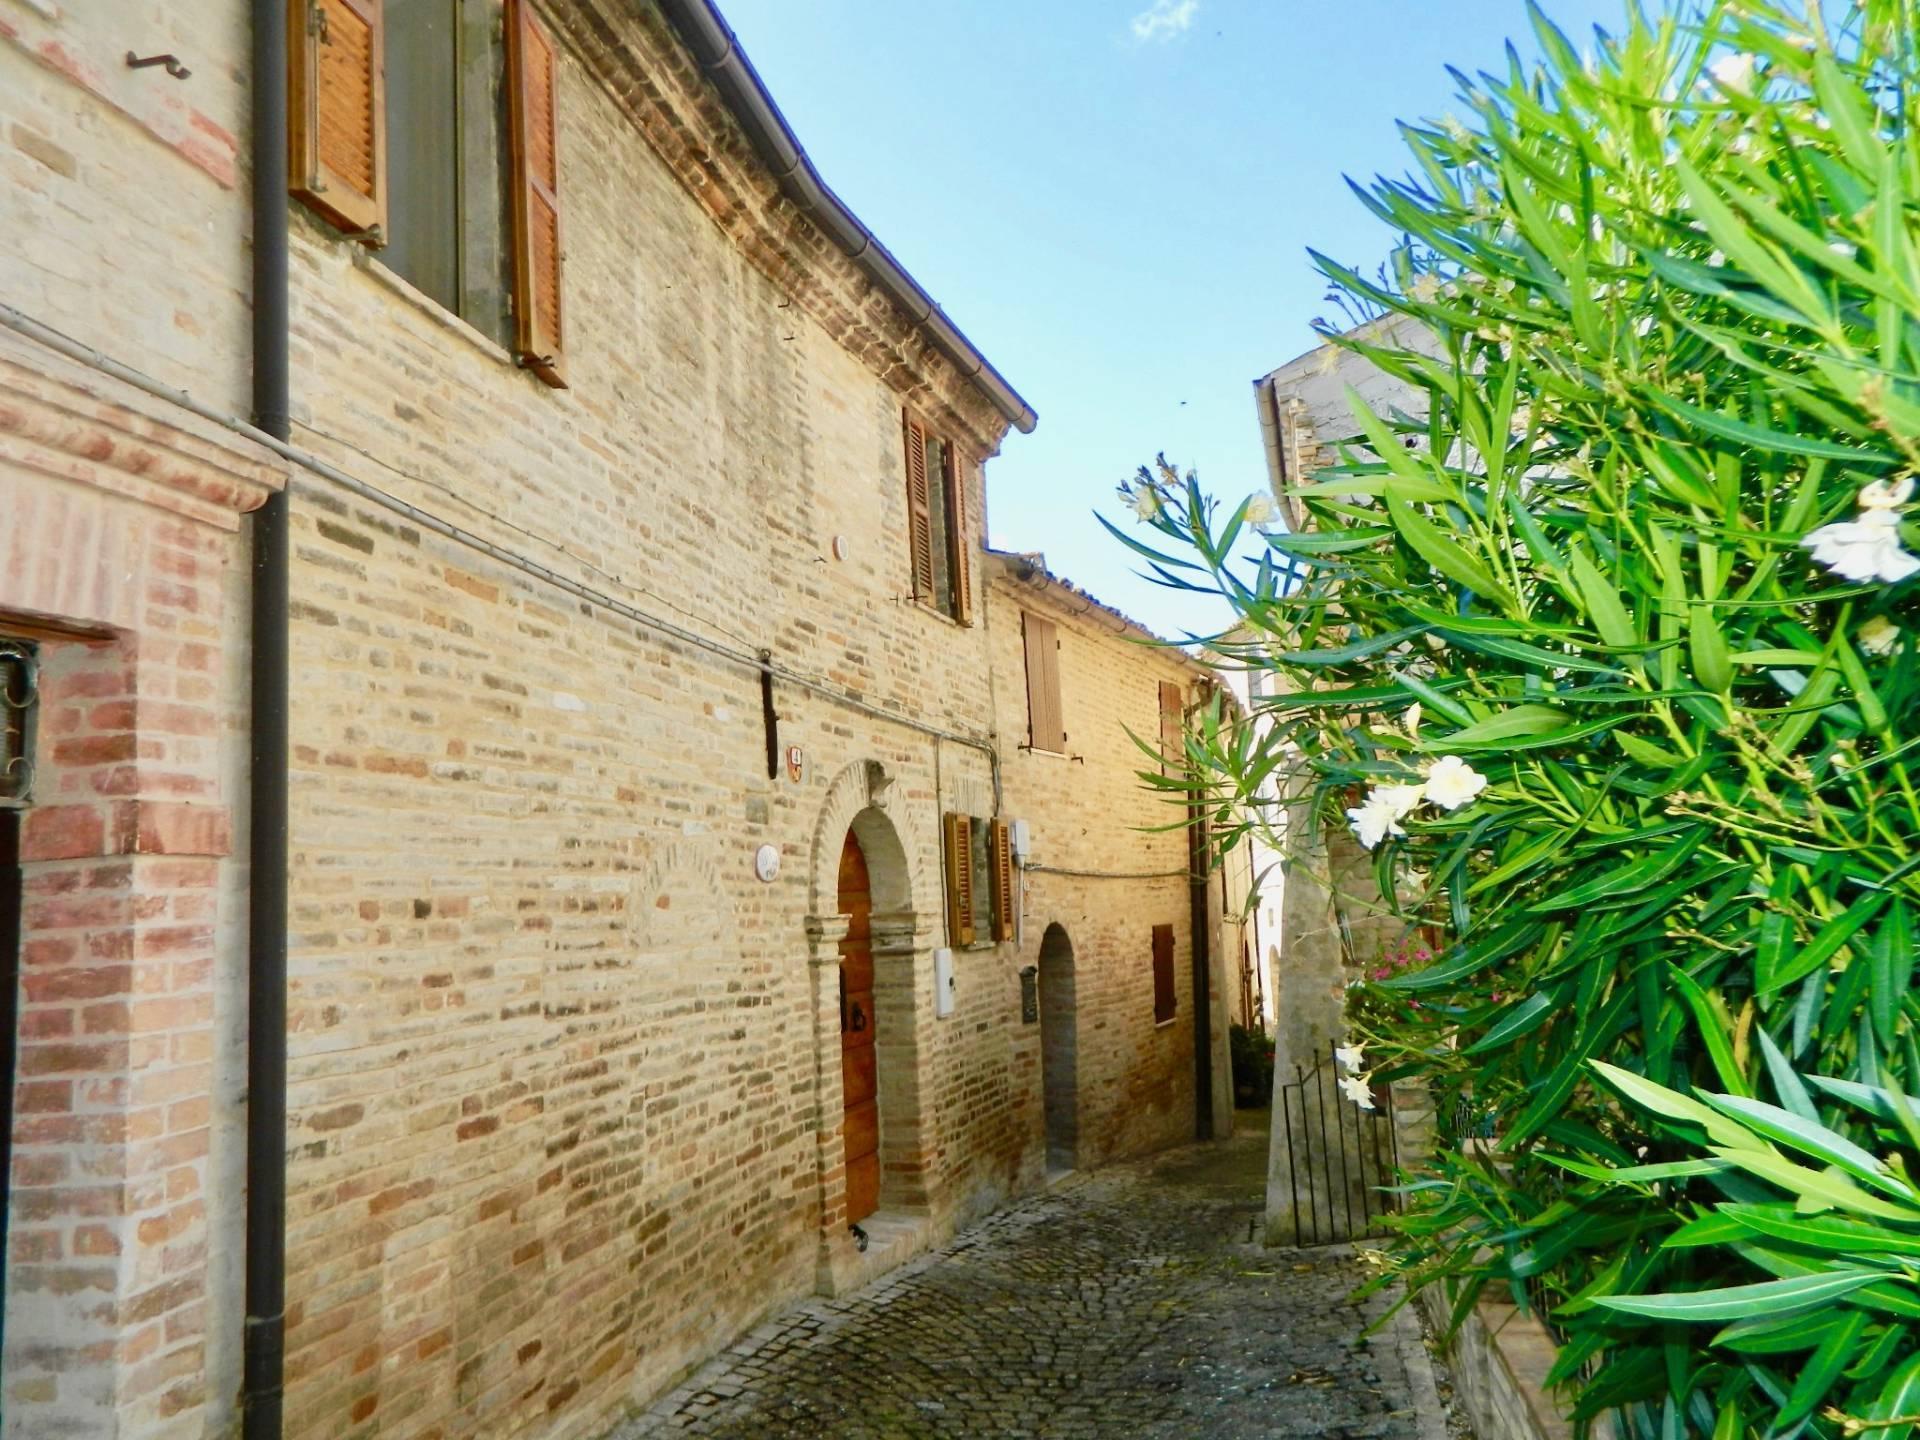 Casa Semindipendente a Montottone (Fermo)